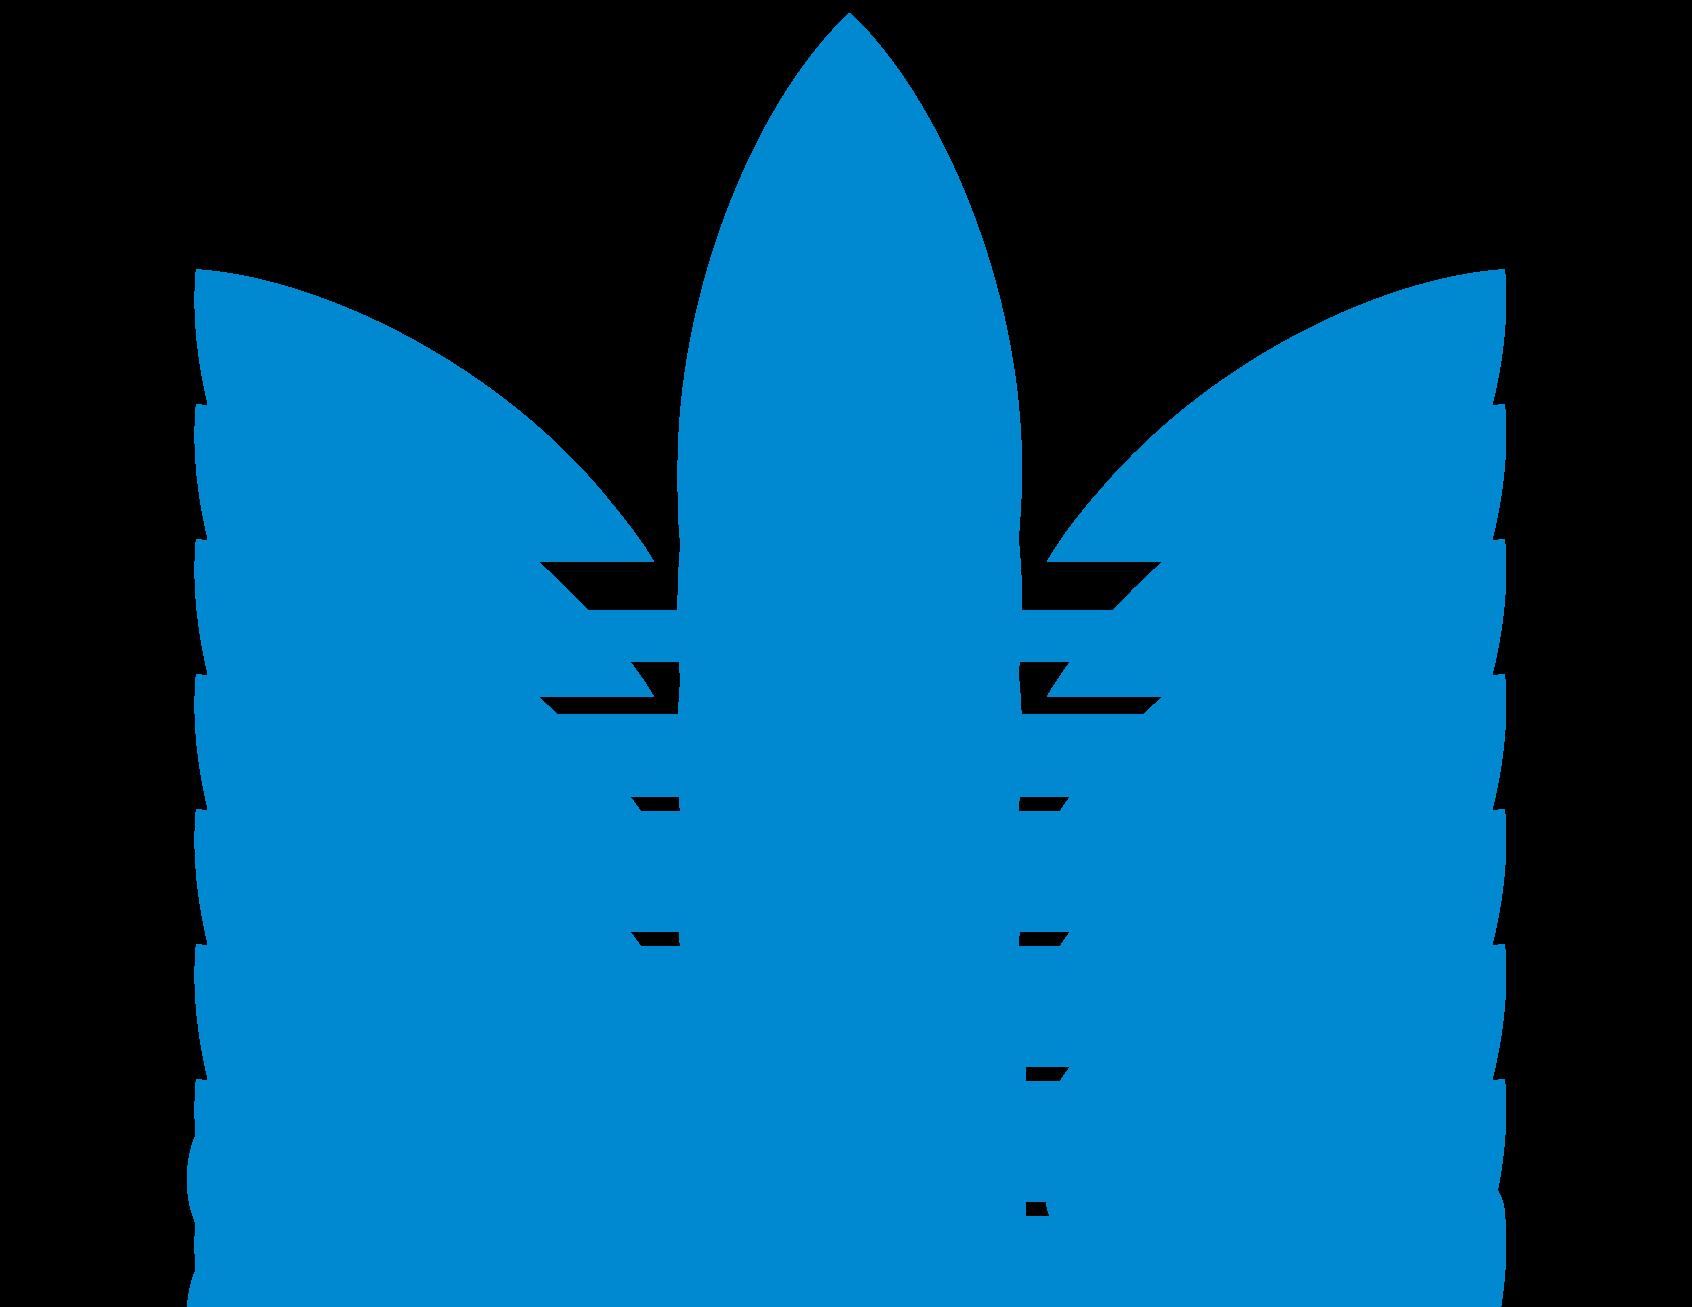 Adidas Predator Telstar 18 Boots Revealed  Footy Headlines